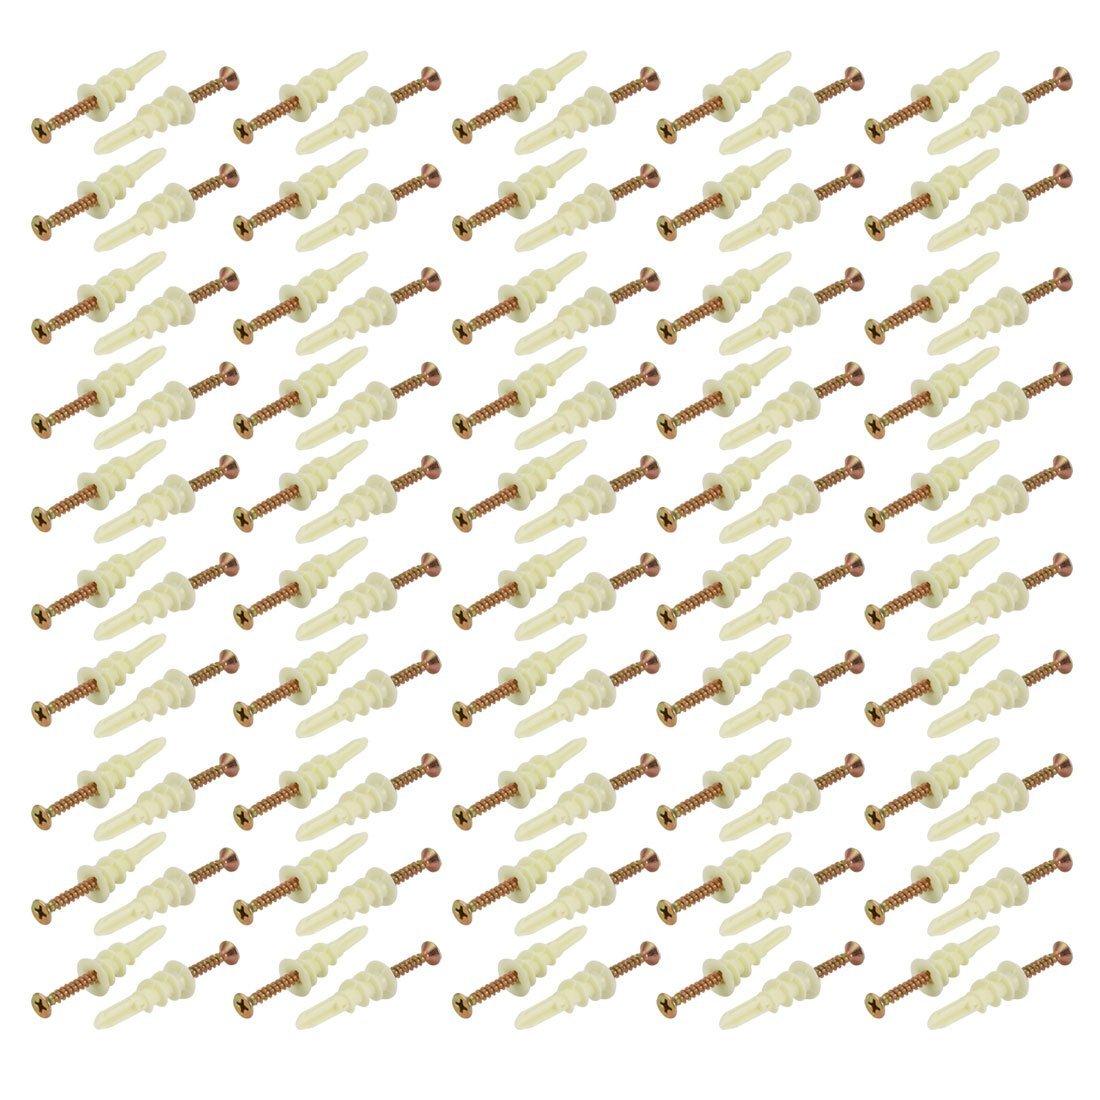 Cheap Screw Anchor Drywall, find Screw Anchor Drywall deals on line